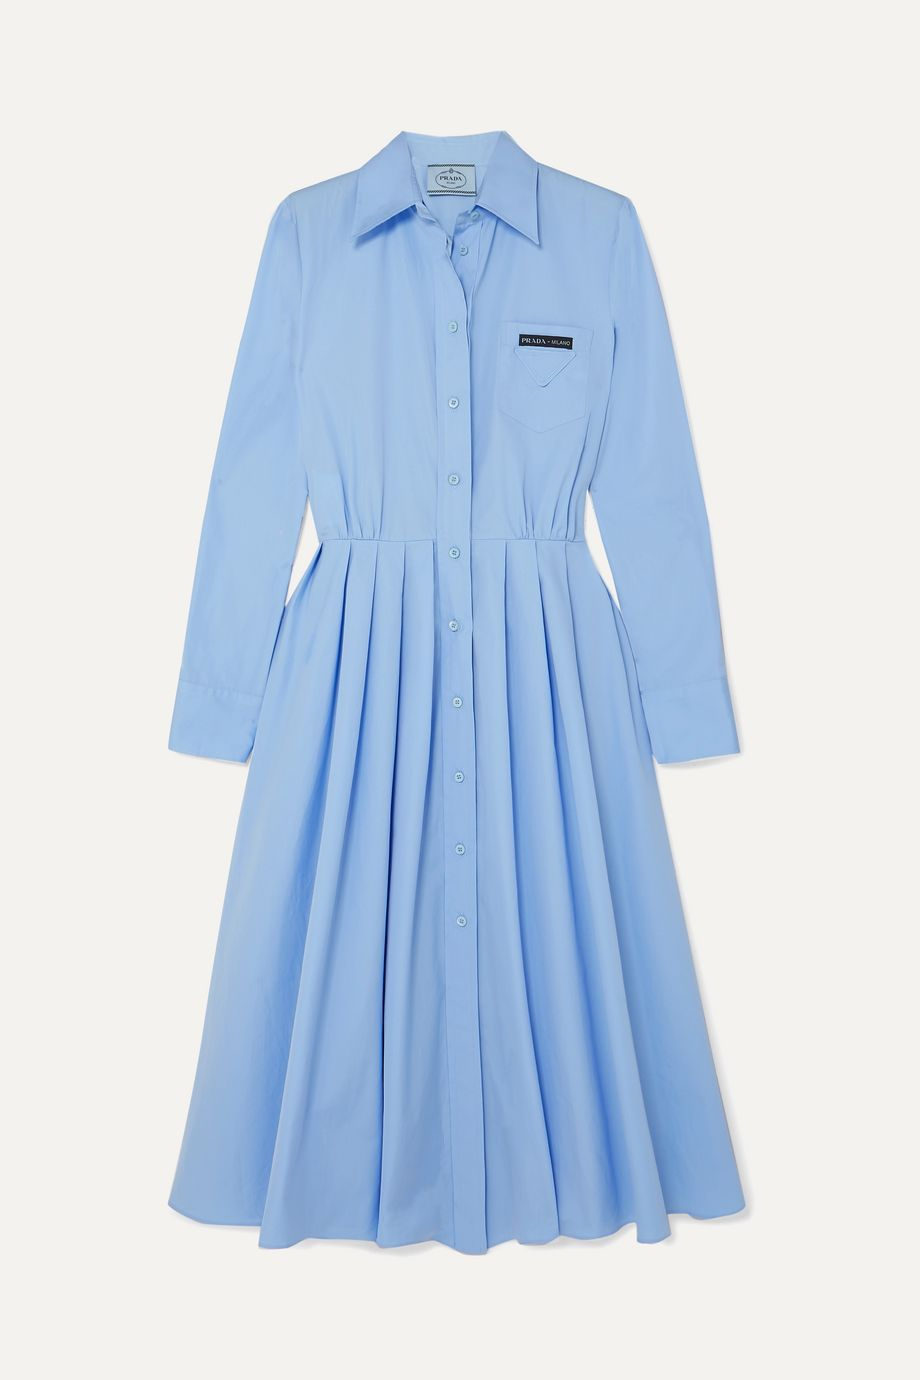 Prada Robe-chemise en coton à plis plats